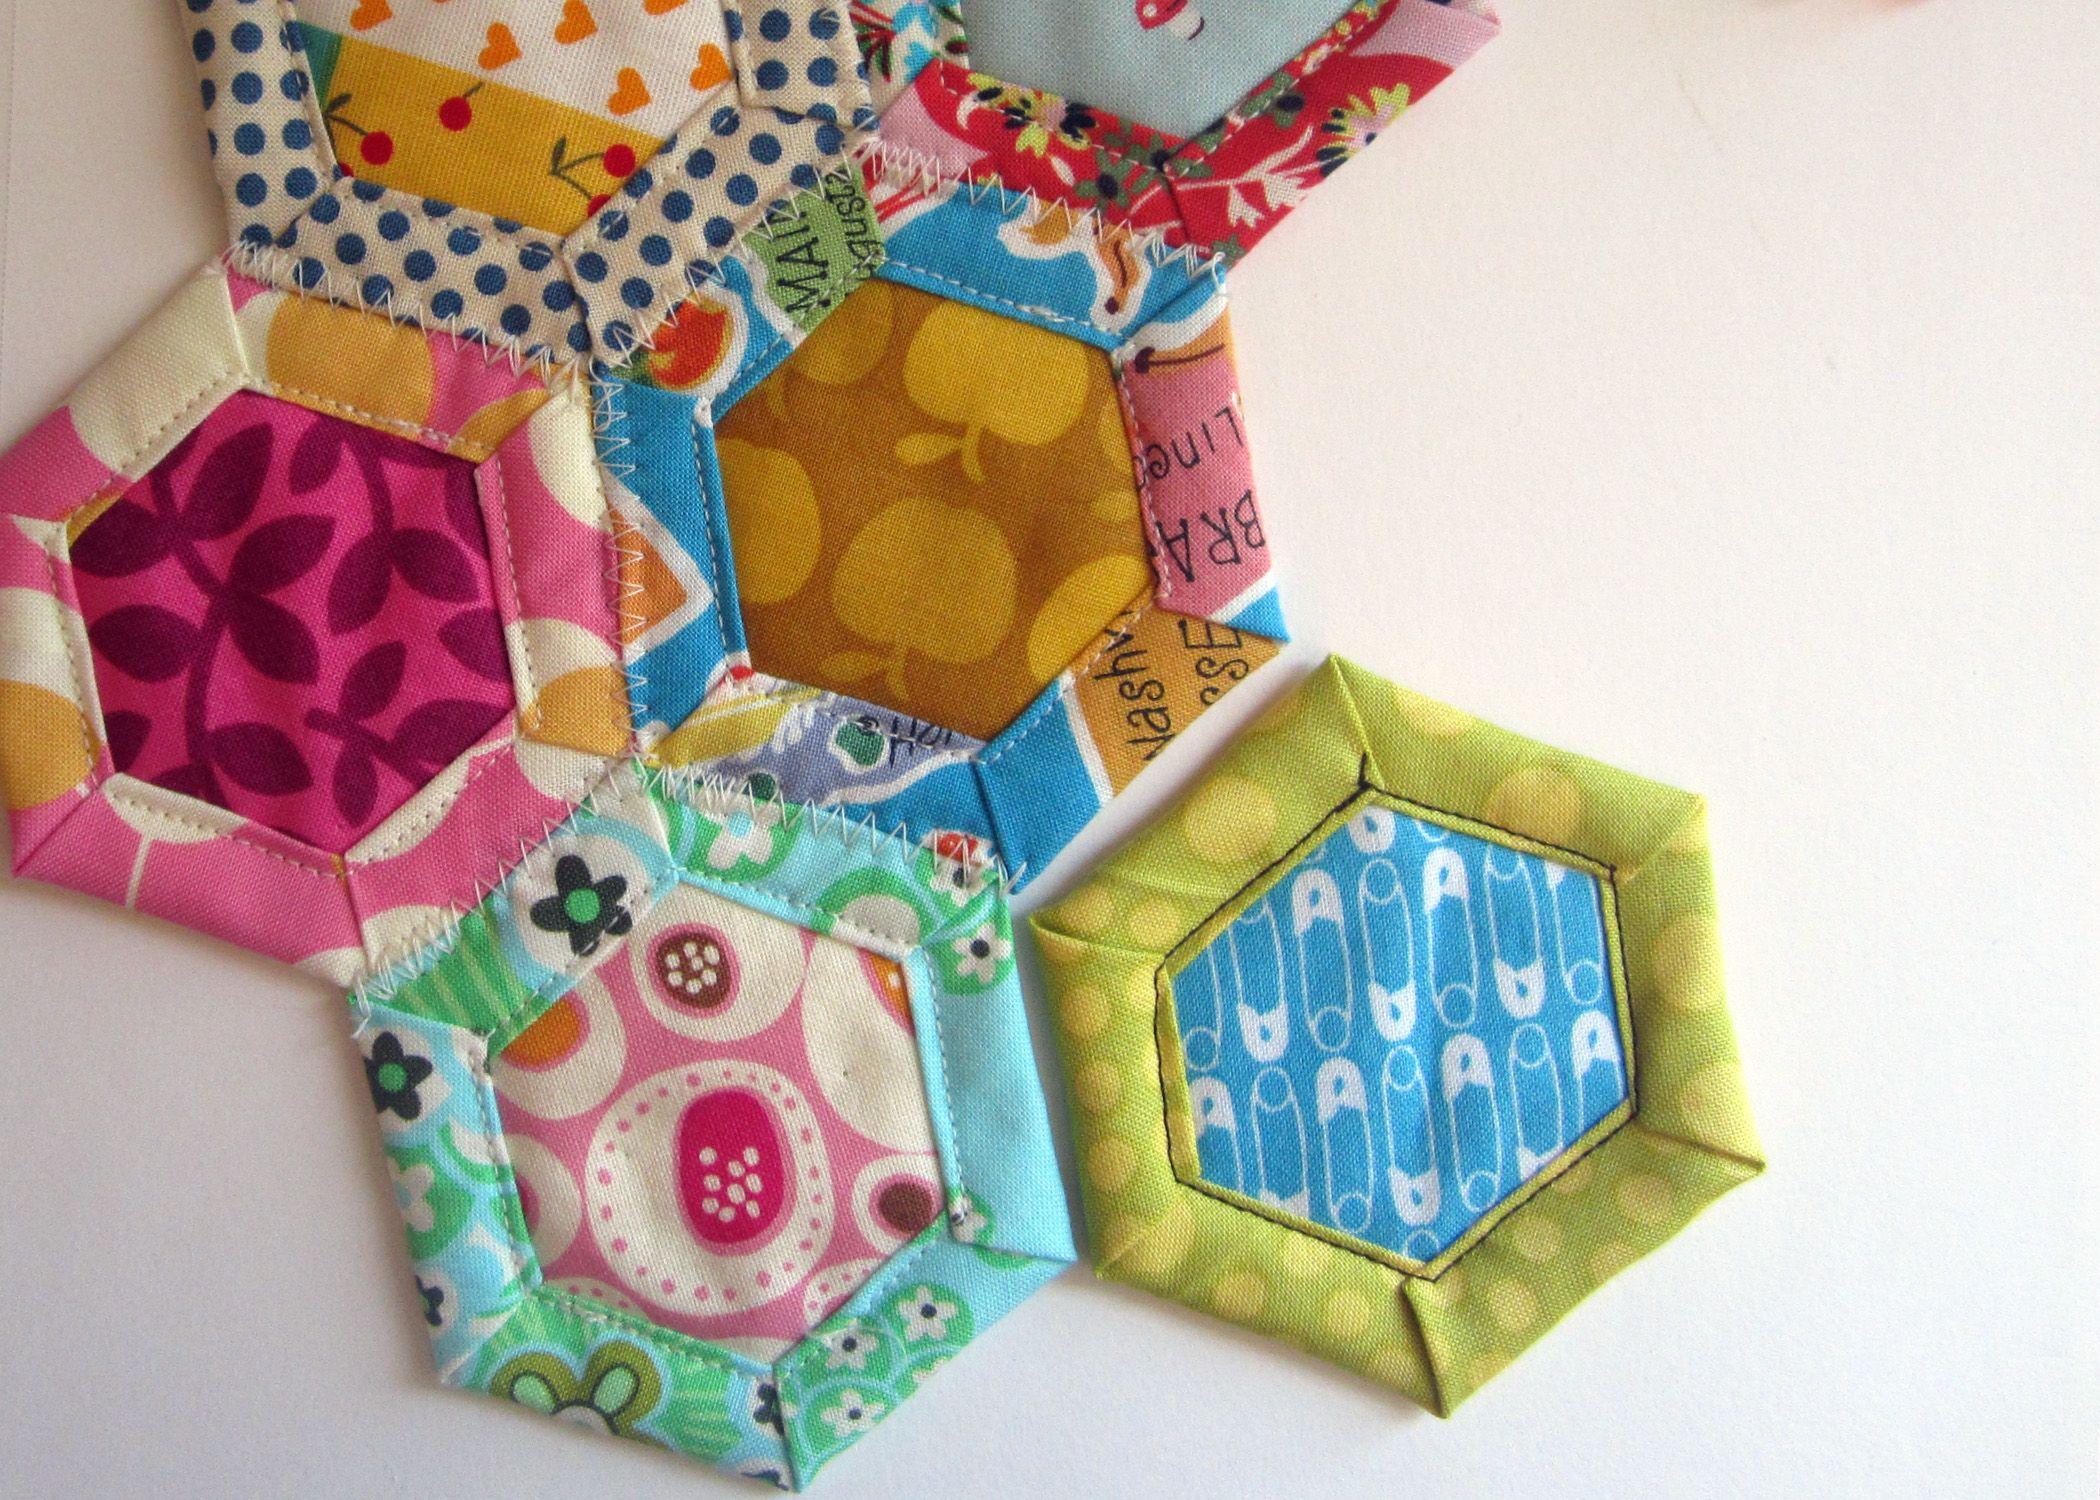 quilt as you go hexagon tutorial | Tracing tools, Hexagon shape ... : go quilt cutter - Adamdwight.com